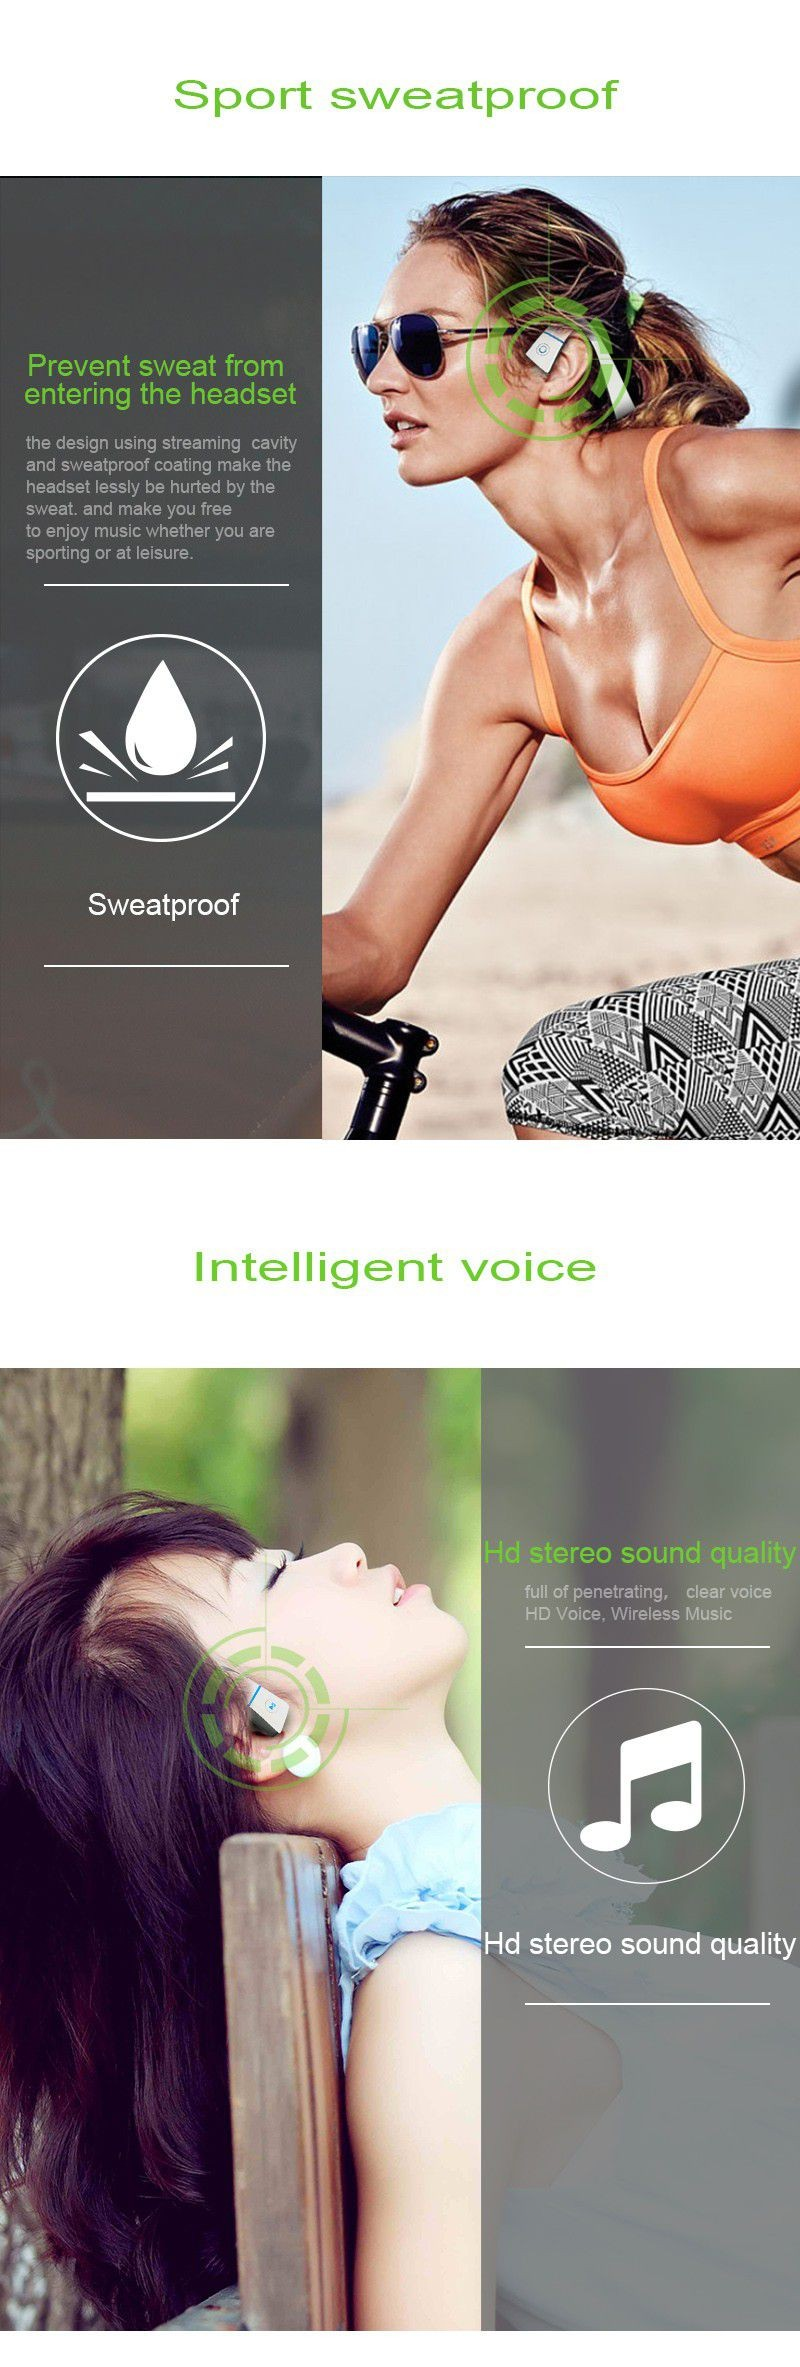 DOITOP Smart LF-18 Bone Conduction NFC Earphone Wireless Bluetooth Stereo Headset BT Waterproof Hands-free Neck-strap Headphone